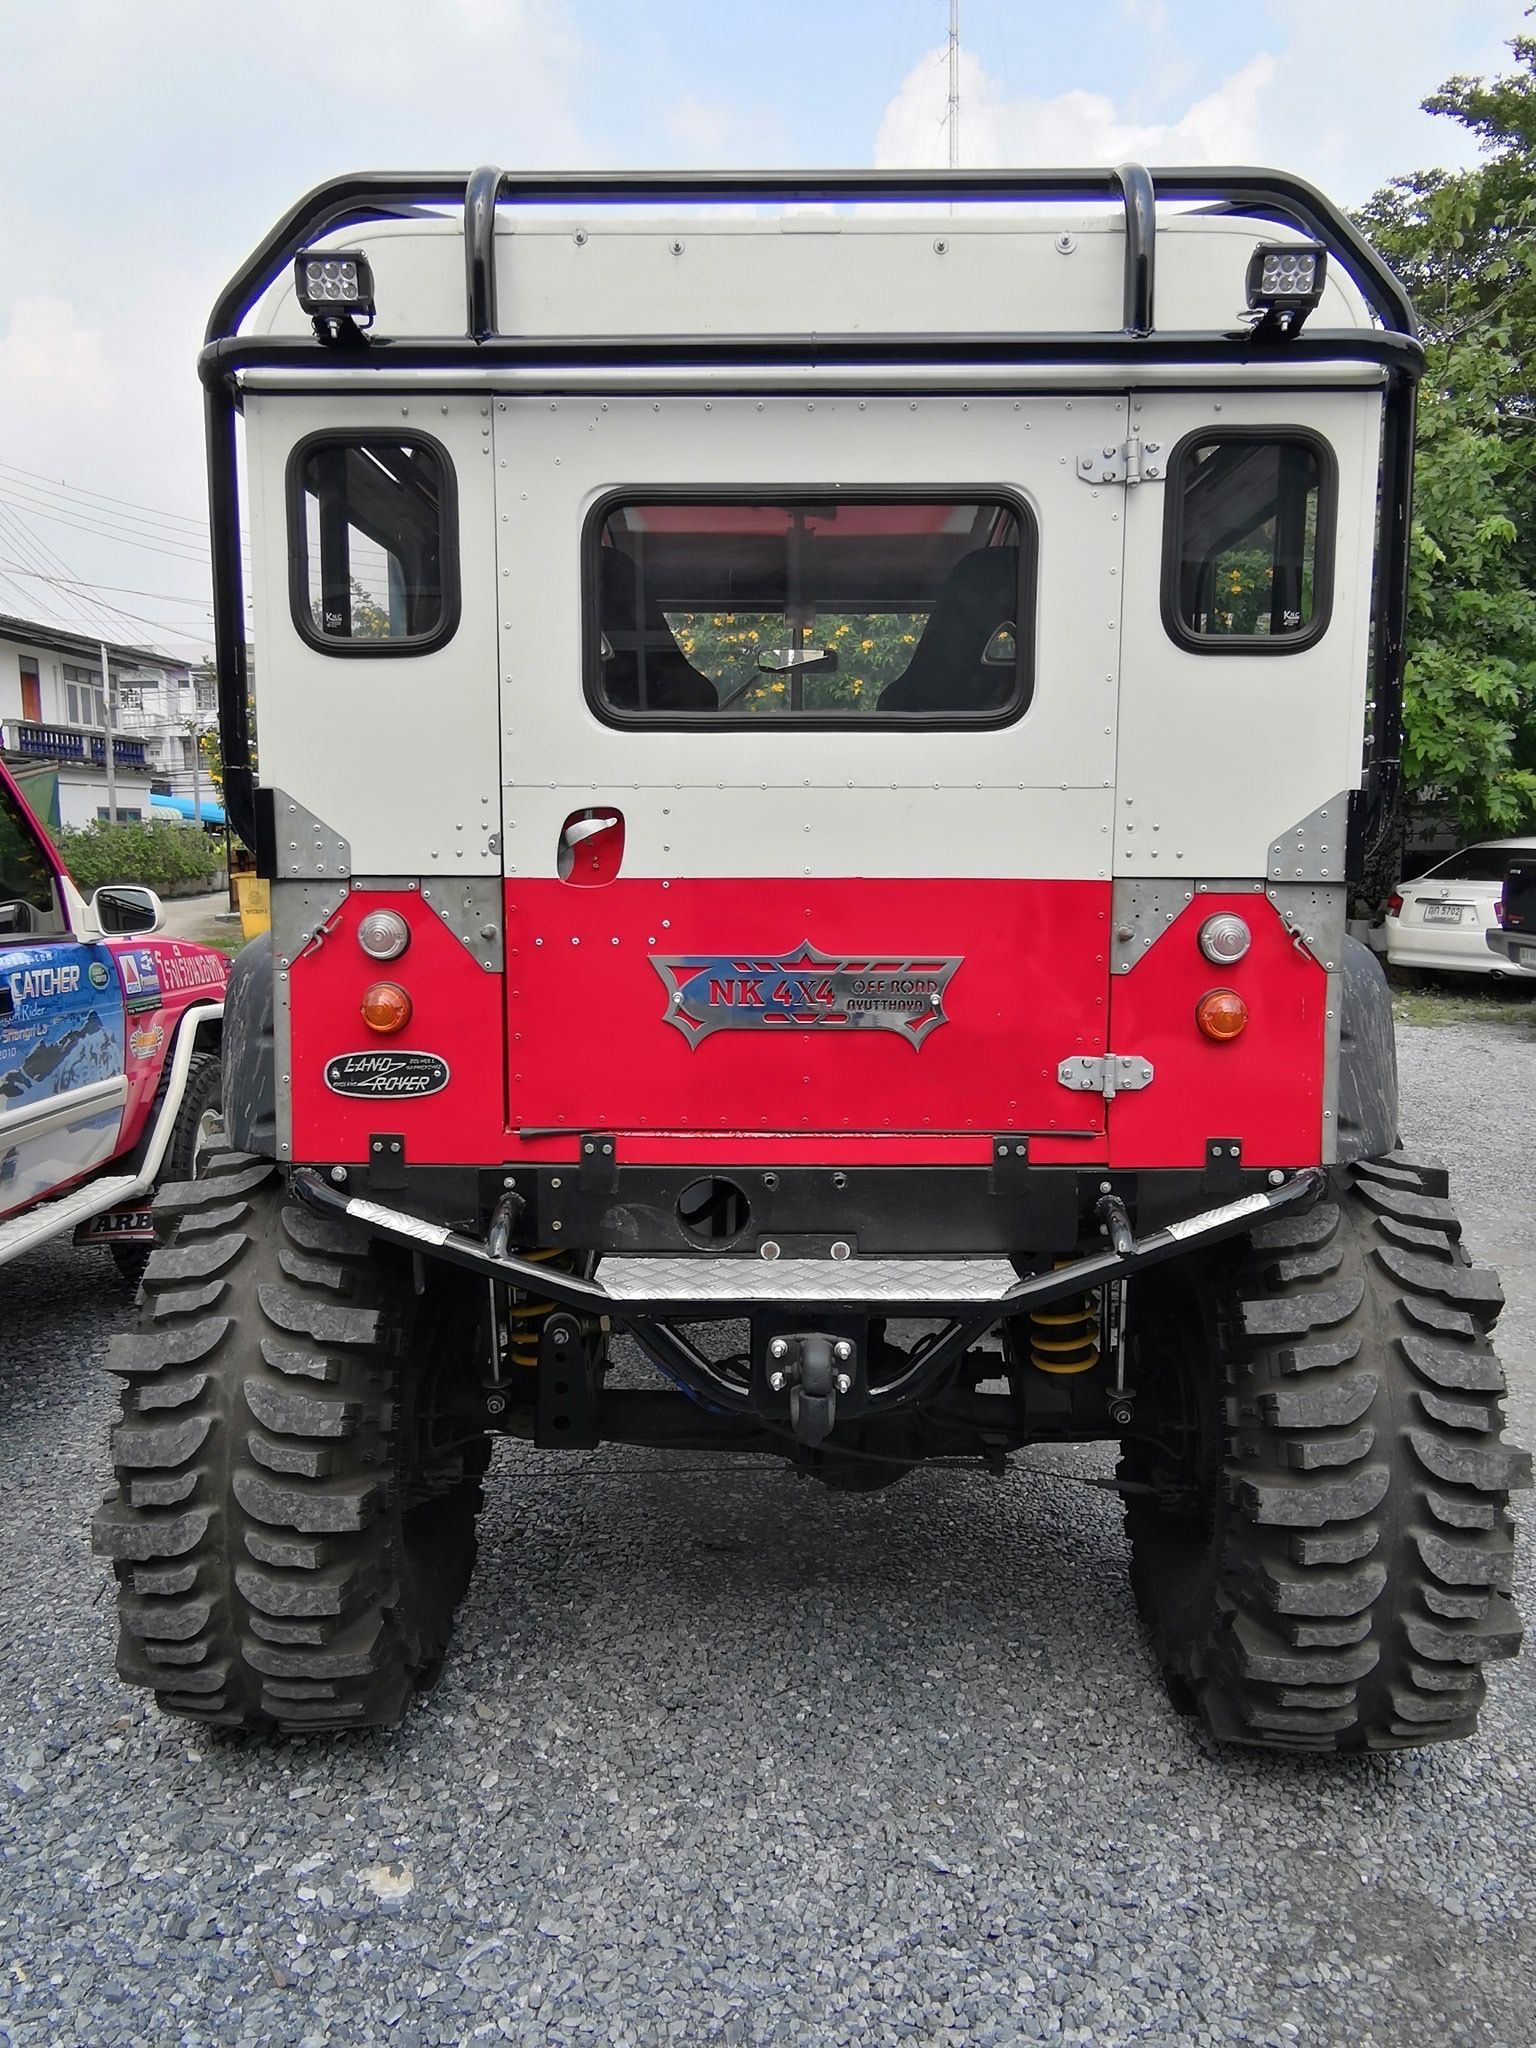 Épinglé par Altered Vision sur Land Rover Defender